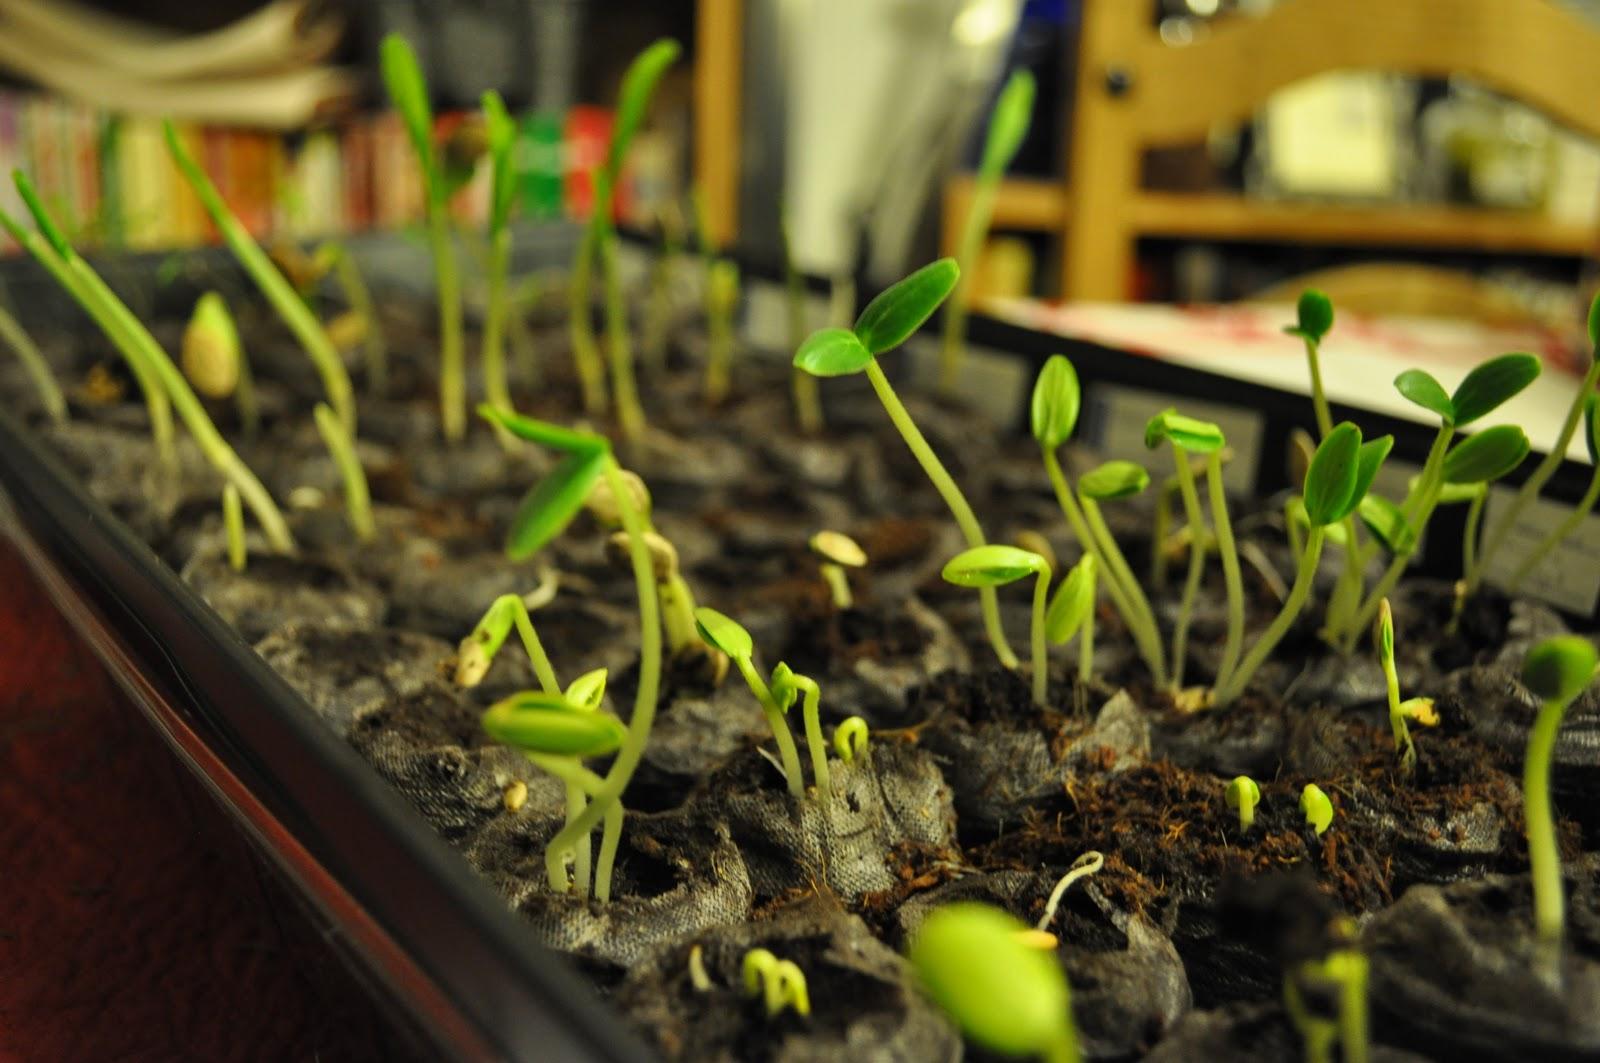 Kitchen Meets Culinary Clutz: Vitameatavegamin Garden... Take IV